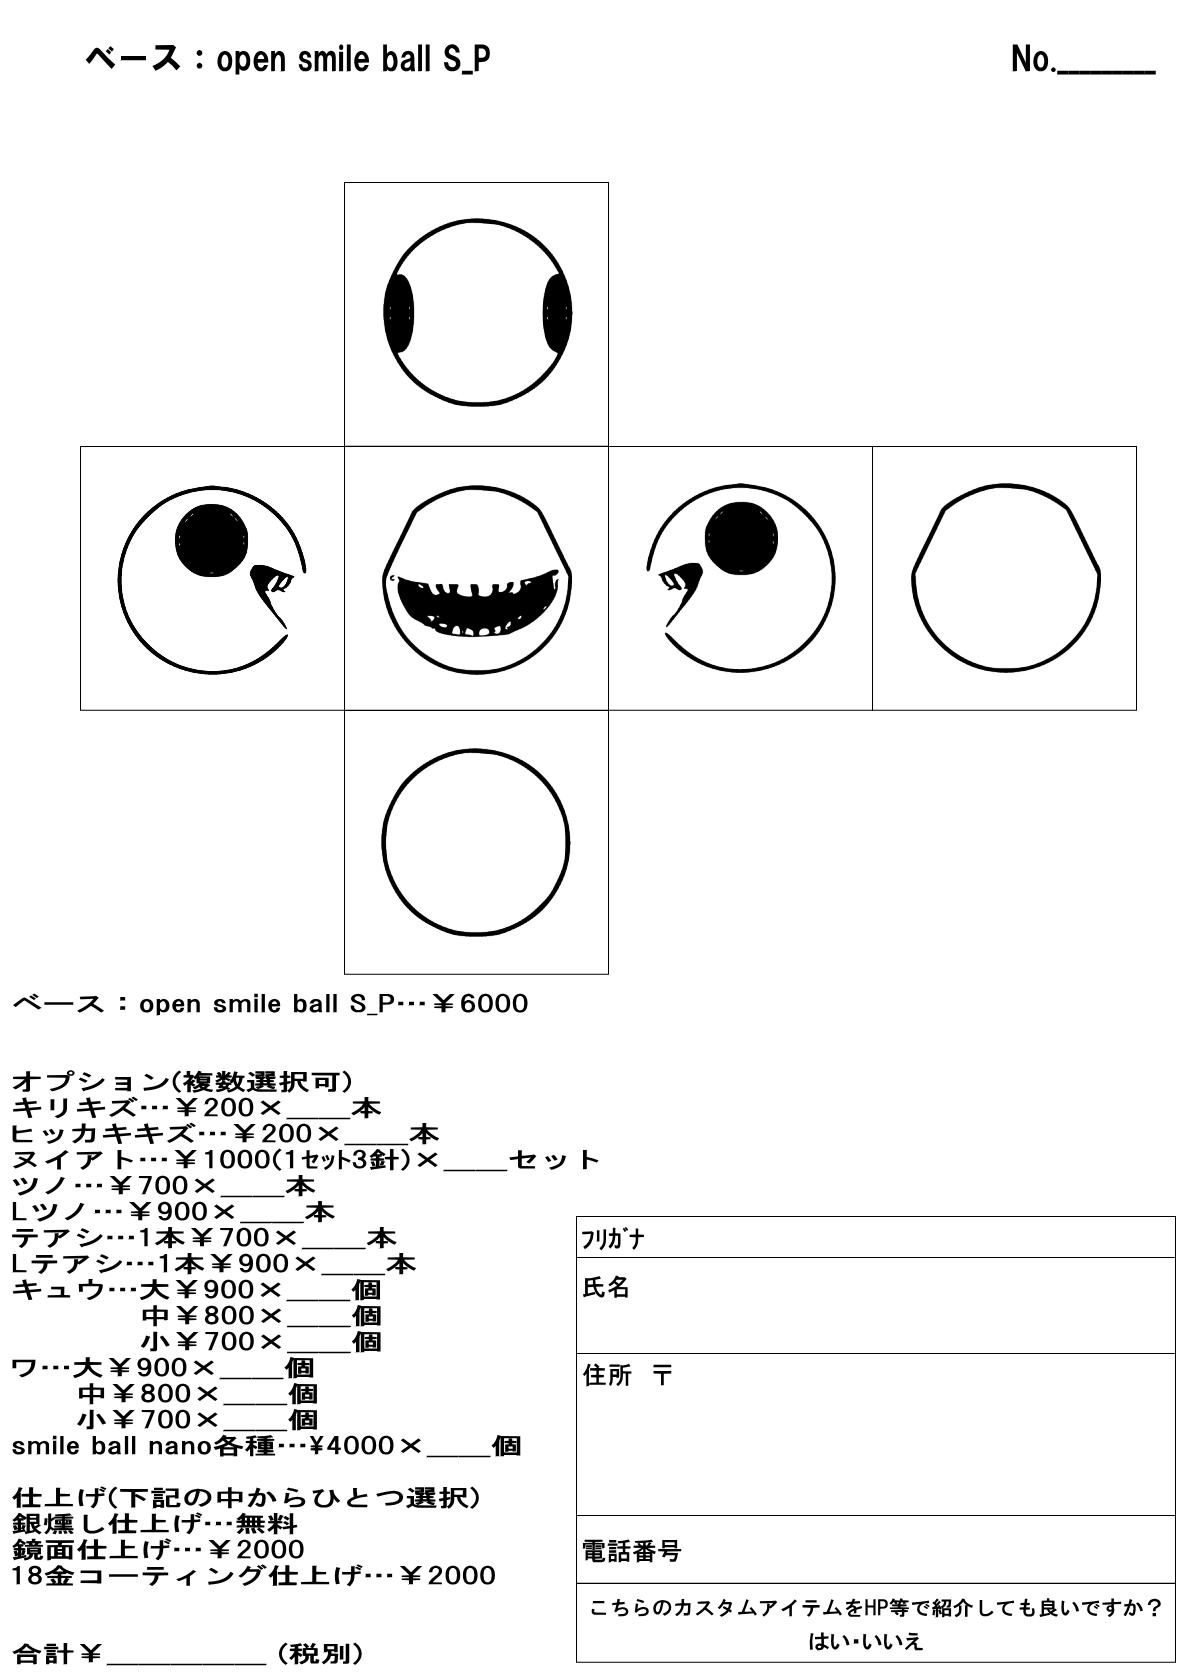 12/2smile_mammyカスタム受注イベント詳細。_d0014014_23134719.jpg